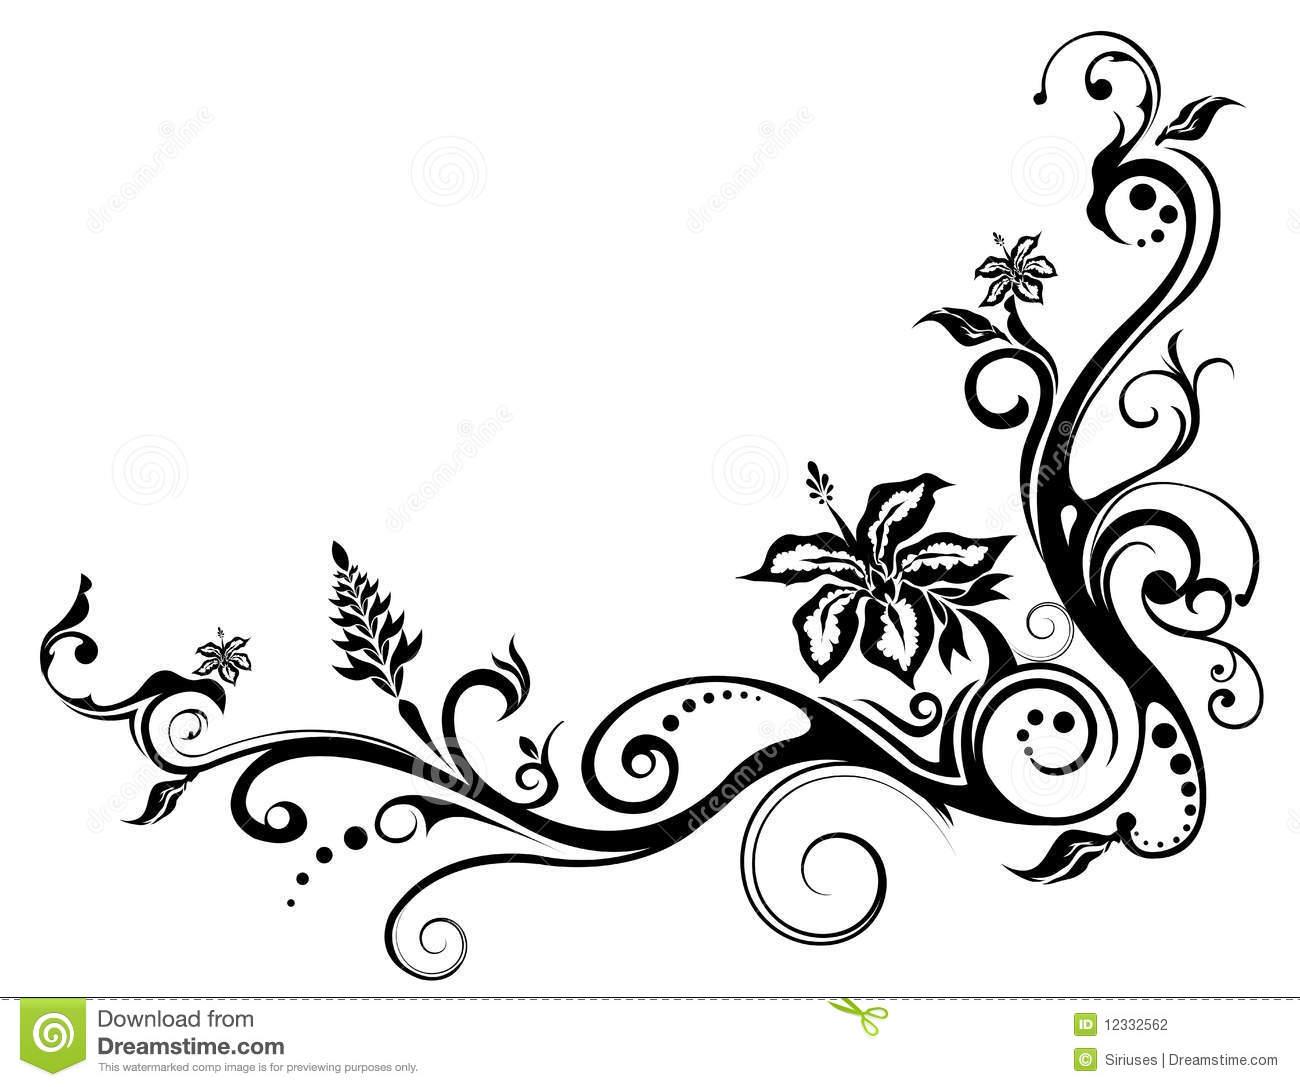 Drawn vine artistic #3